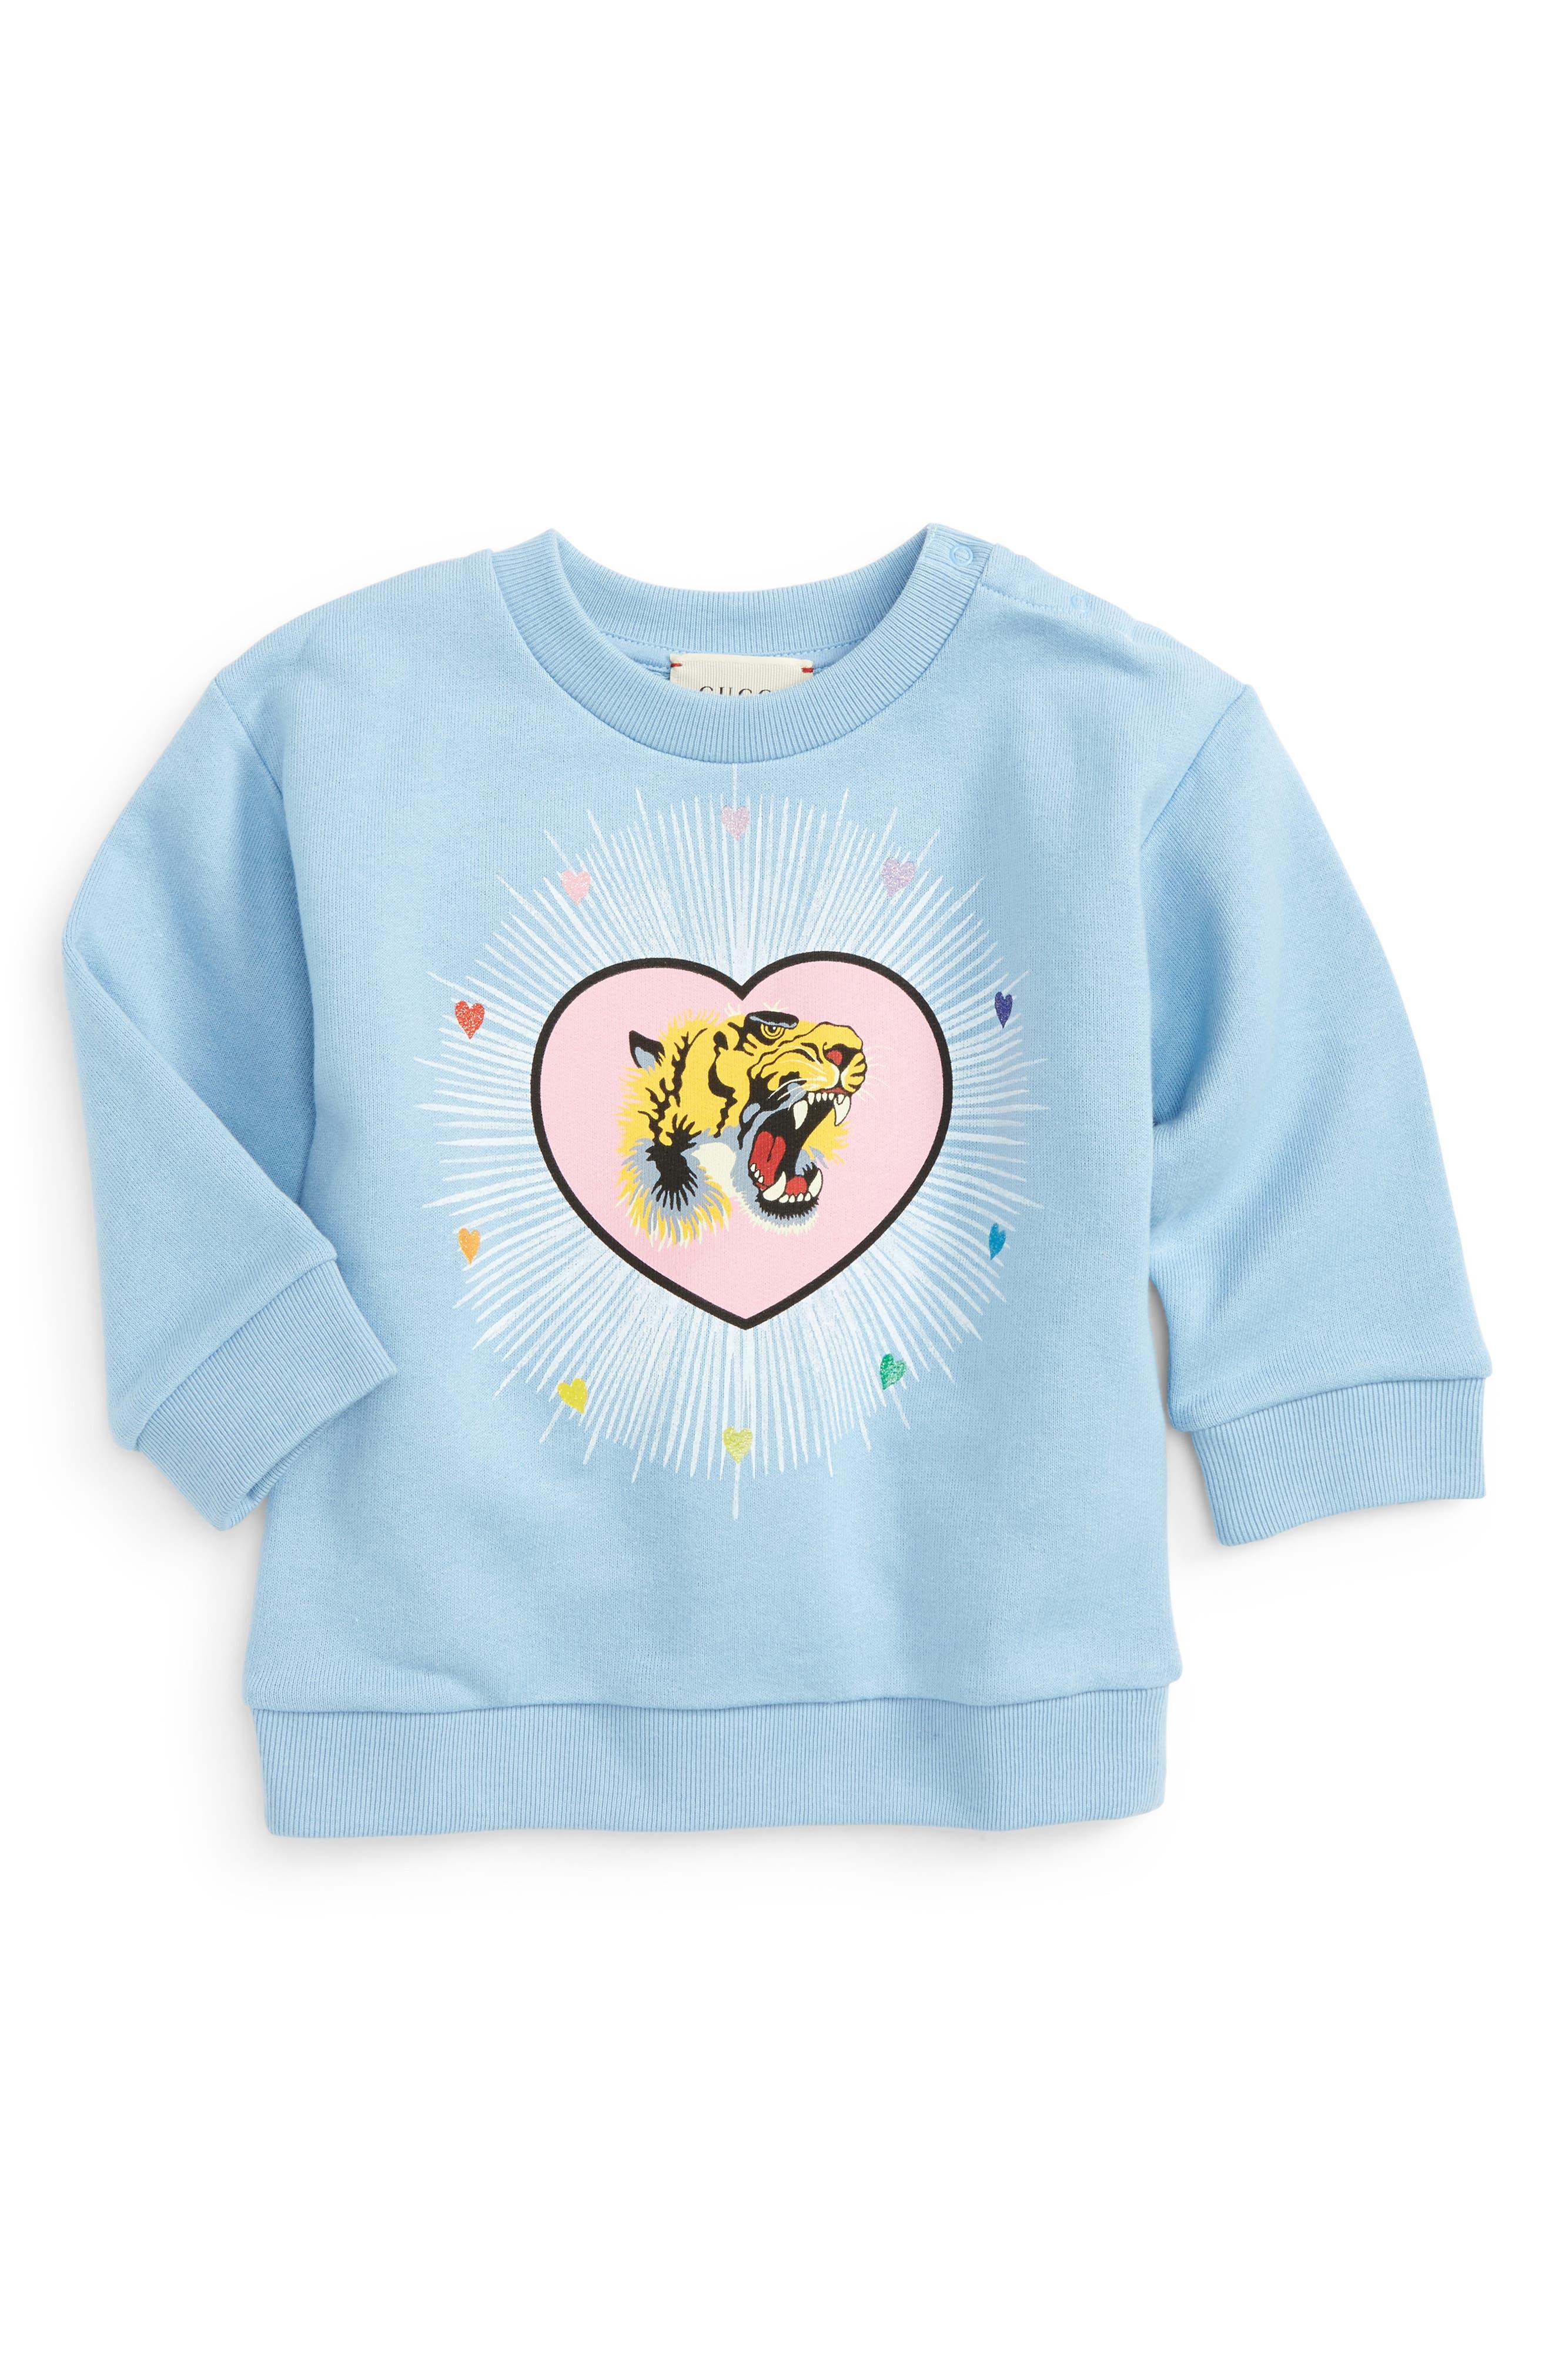 Gucci Tiger Heart Print Sweatshirt (Baby Girls)